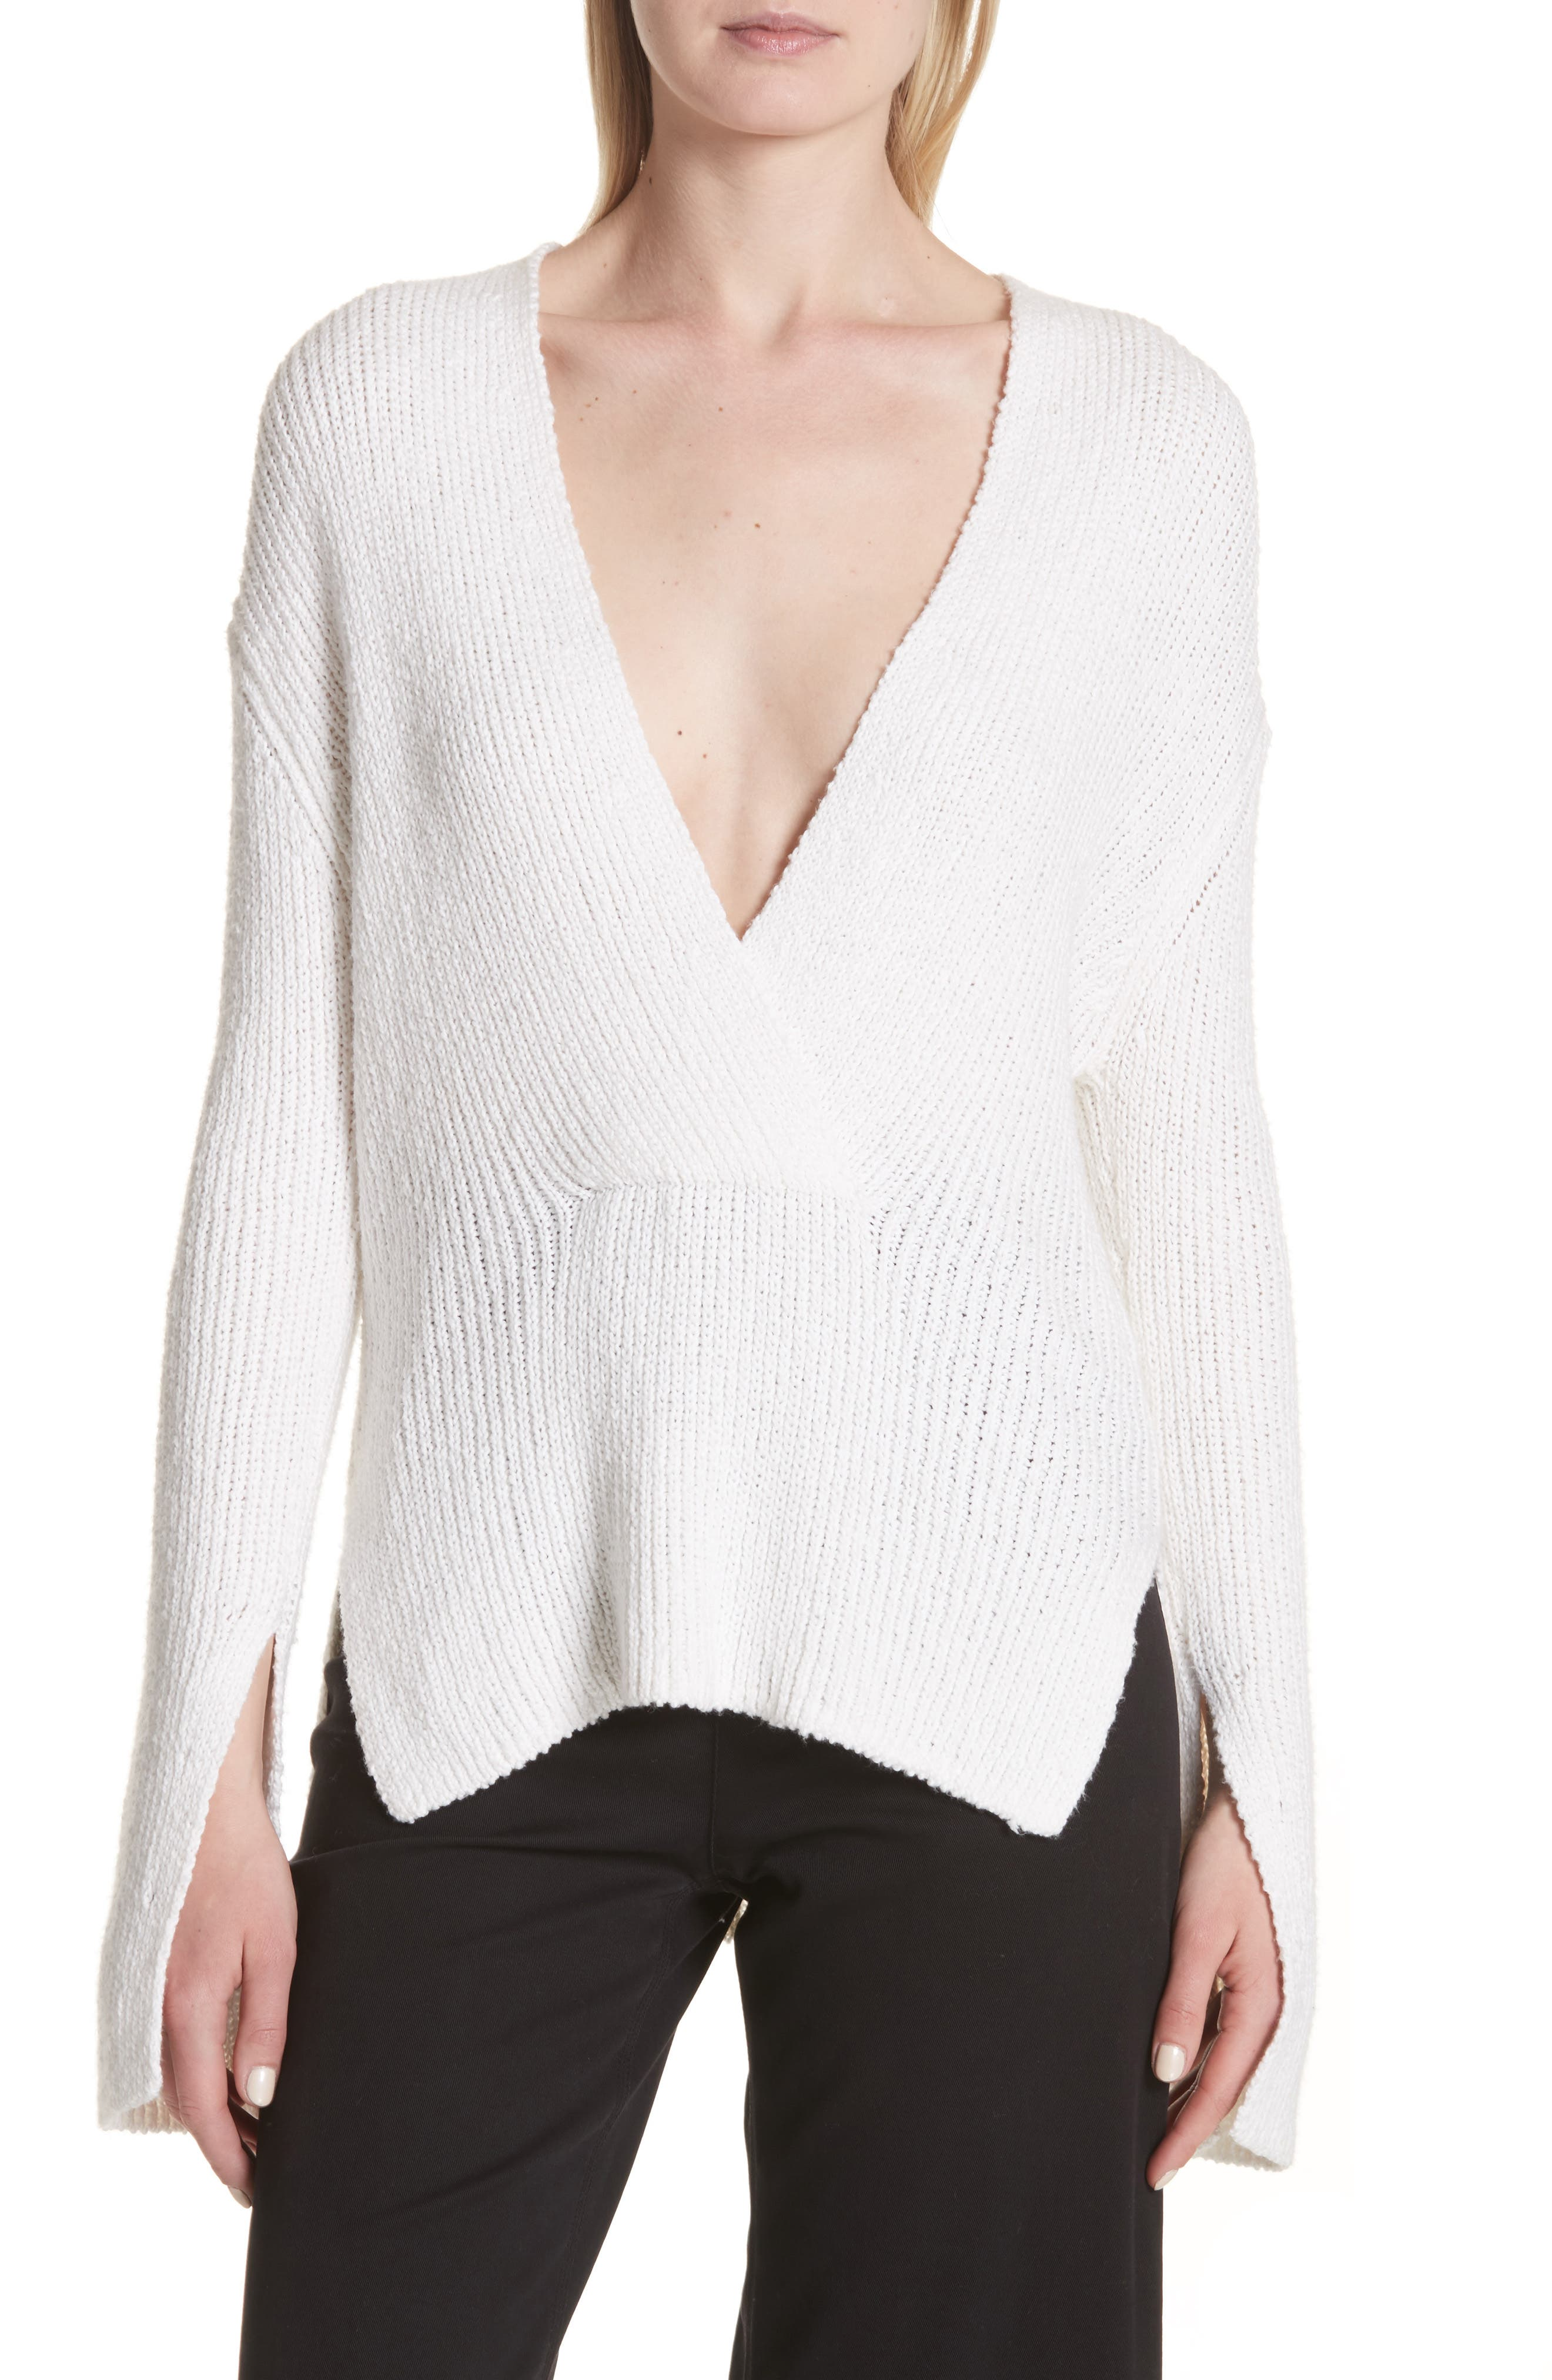 Nick Cotton Sweater,                         Main,                         color, White